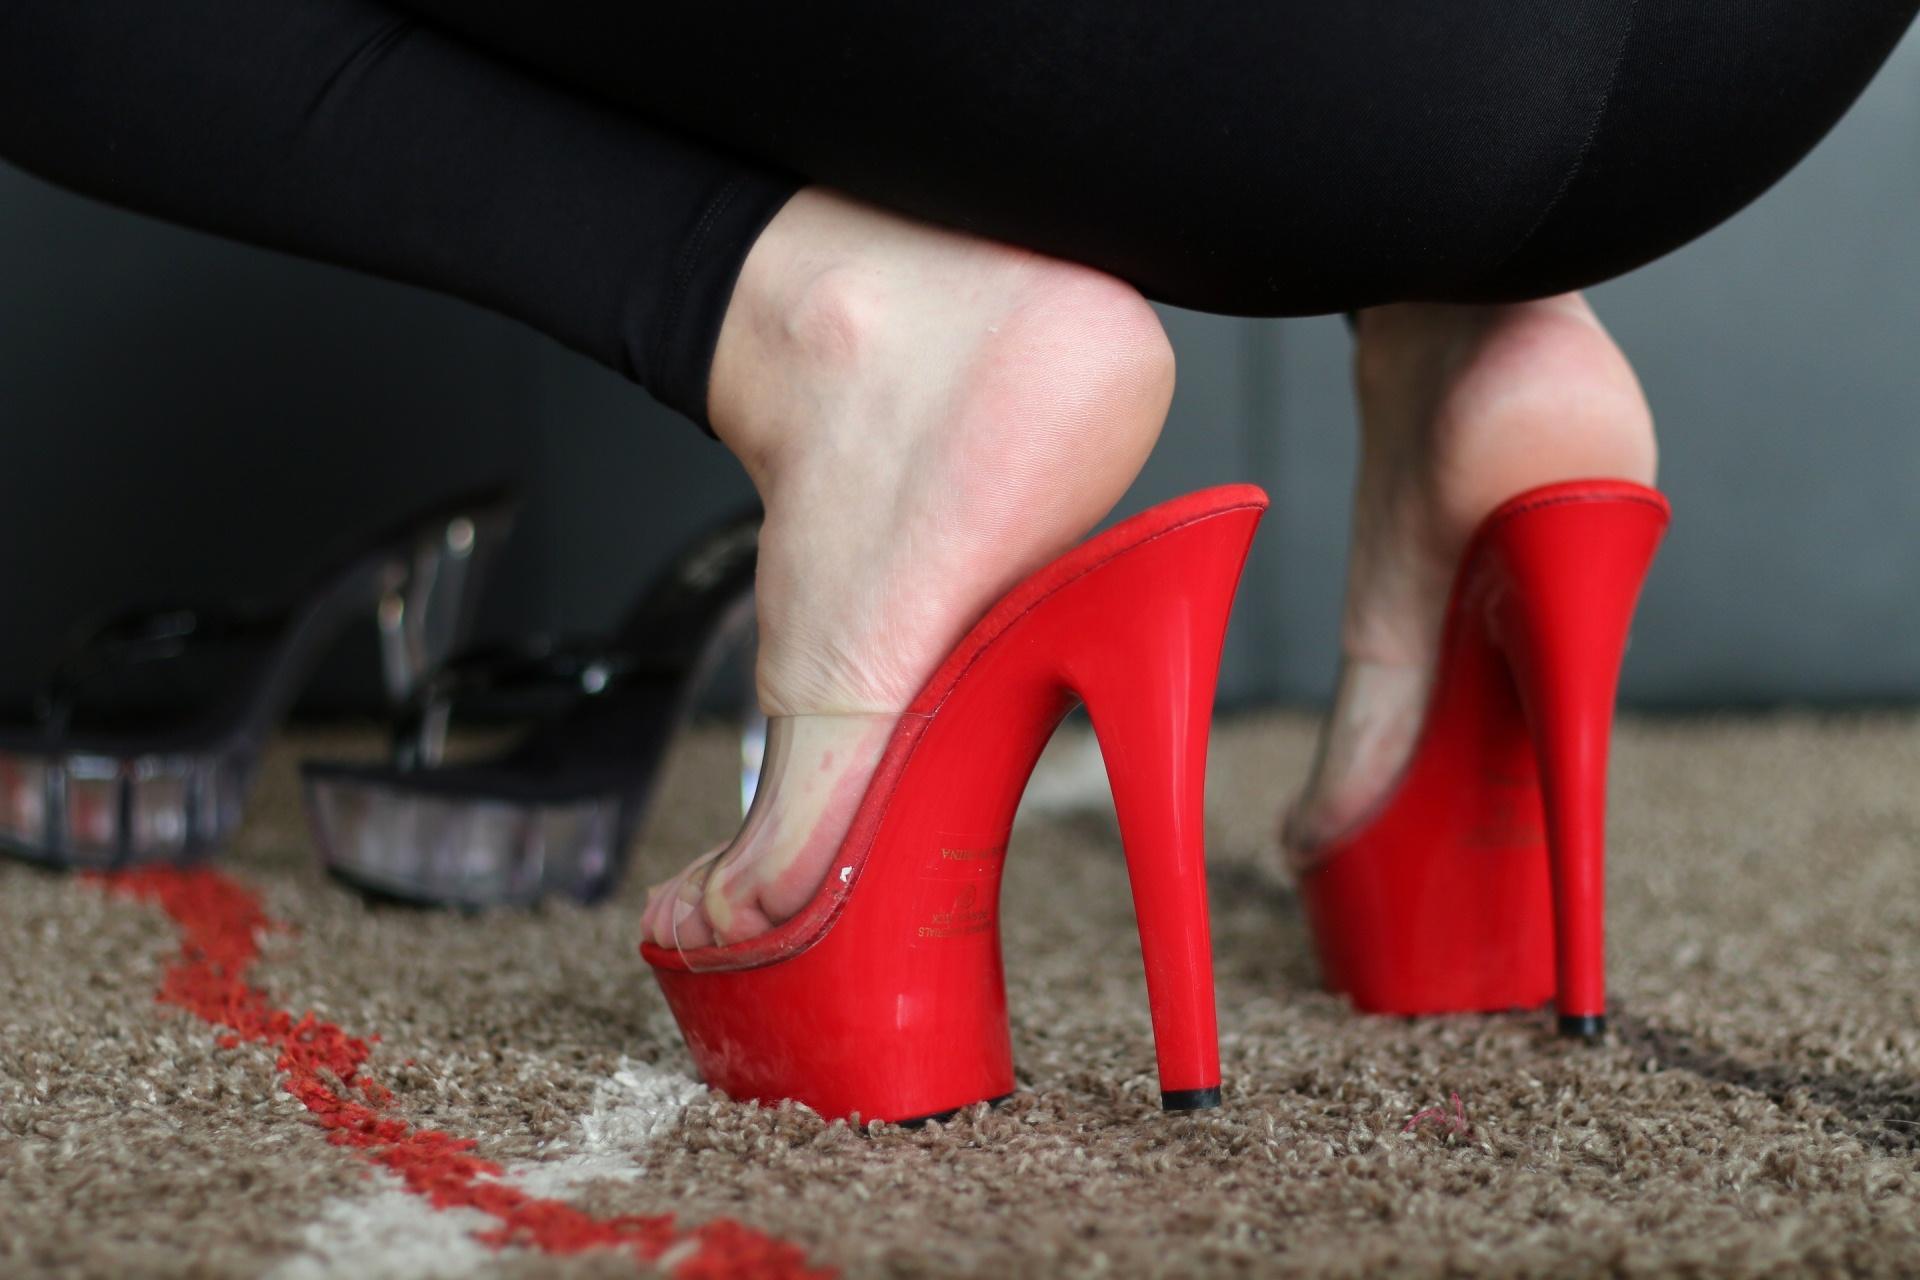 Fond D'écran : Rouge, Jambes, Collants, Bas, Mode, Chaussures